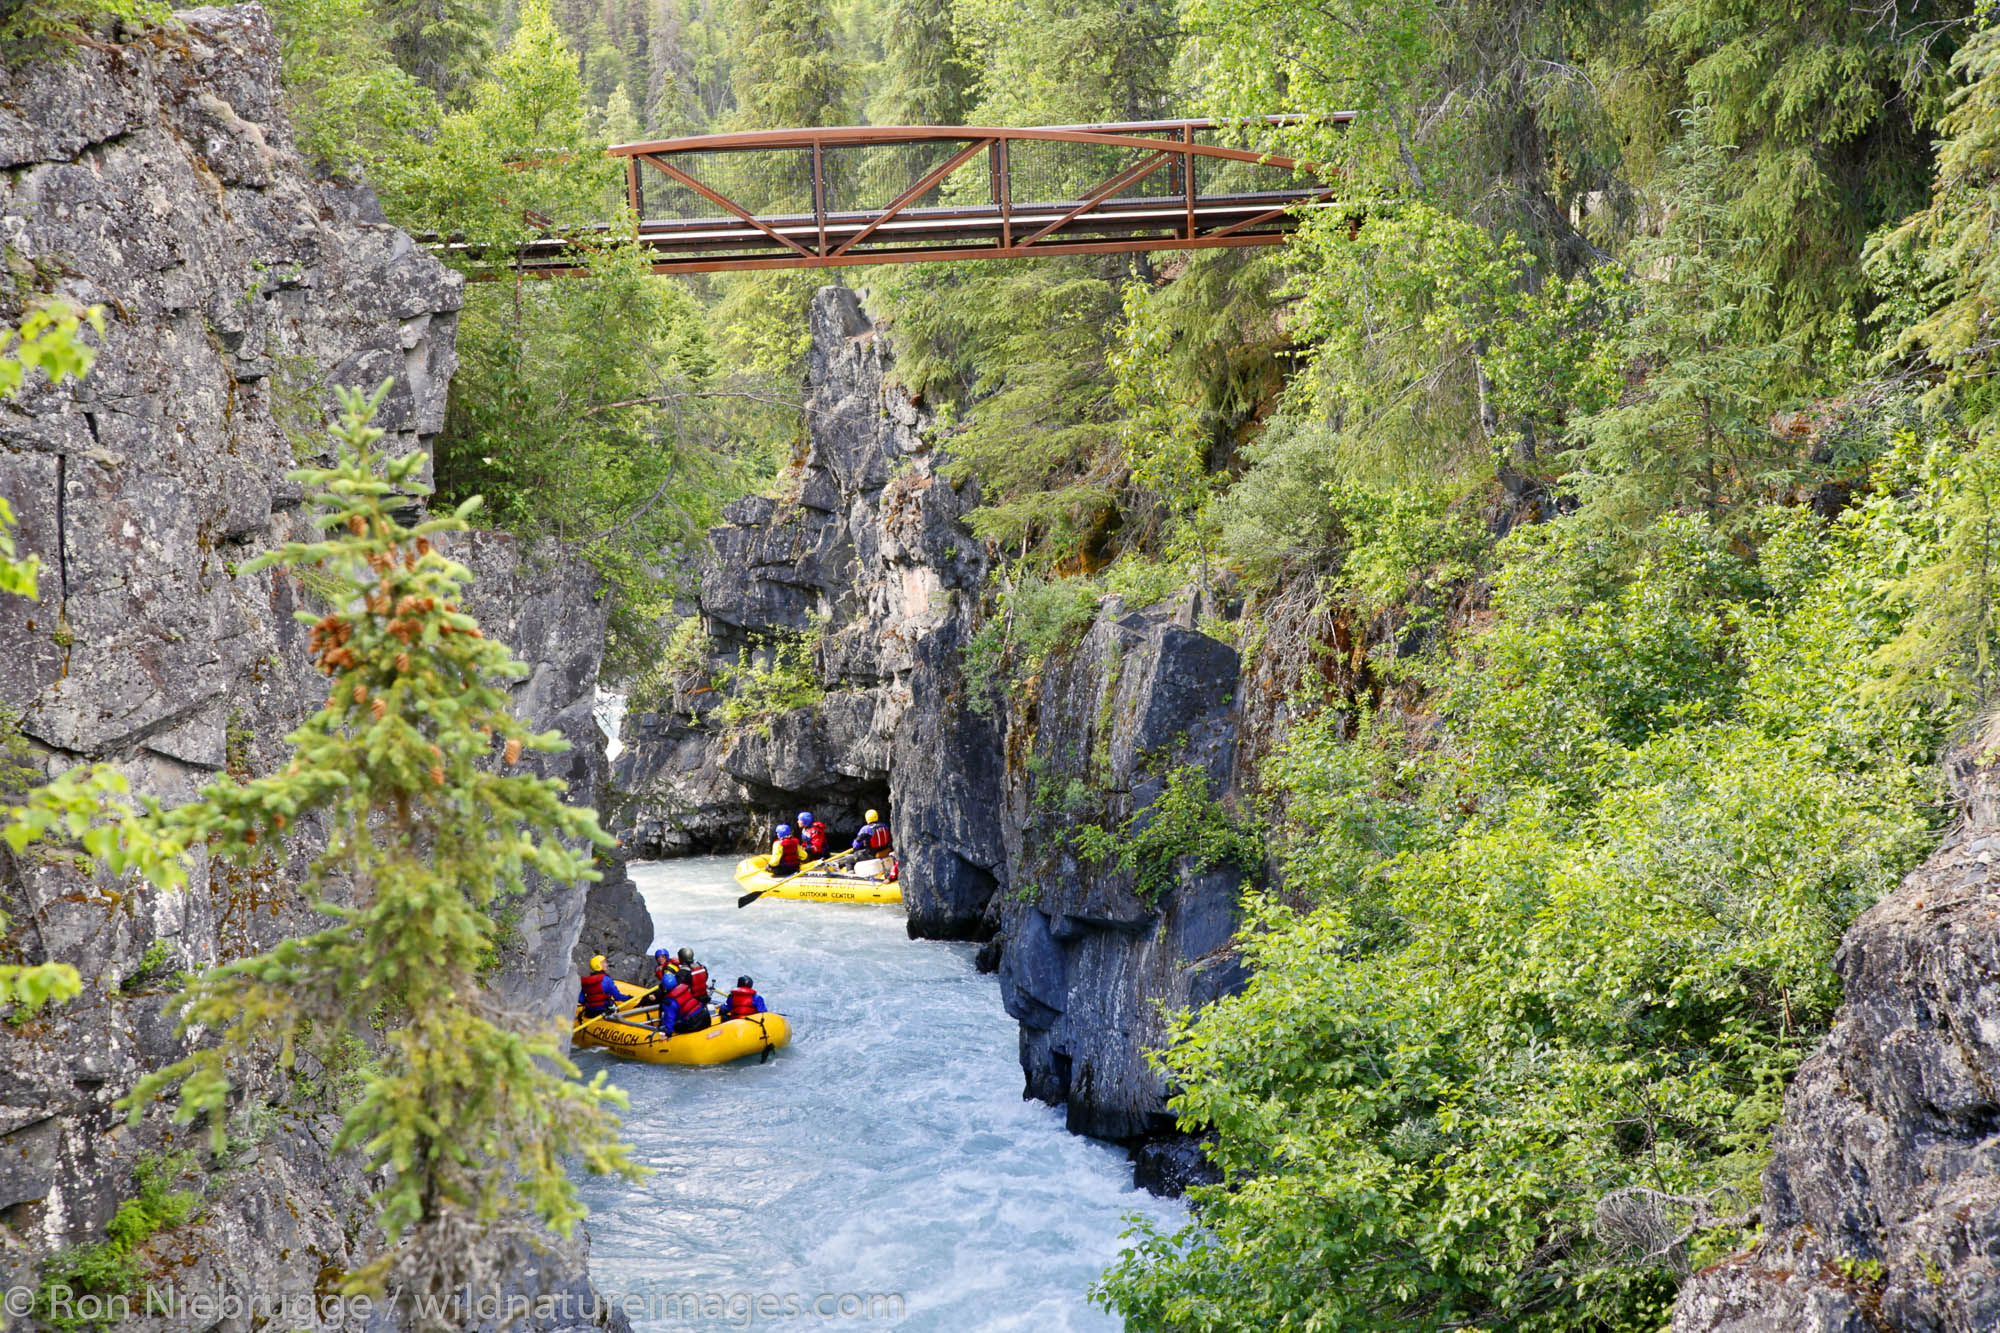 White Water Rafting Six Mile Creek, Kenai Peninsula, Chugach National Forest, Alaska.